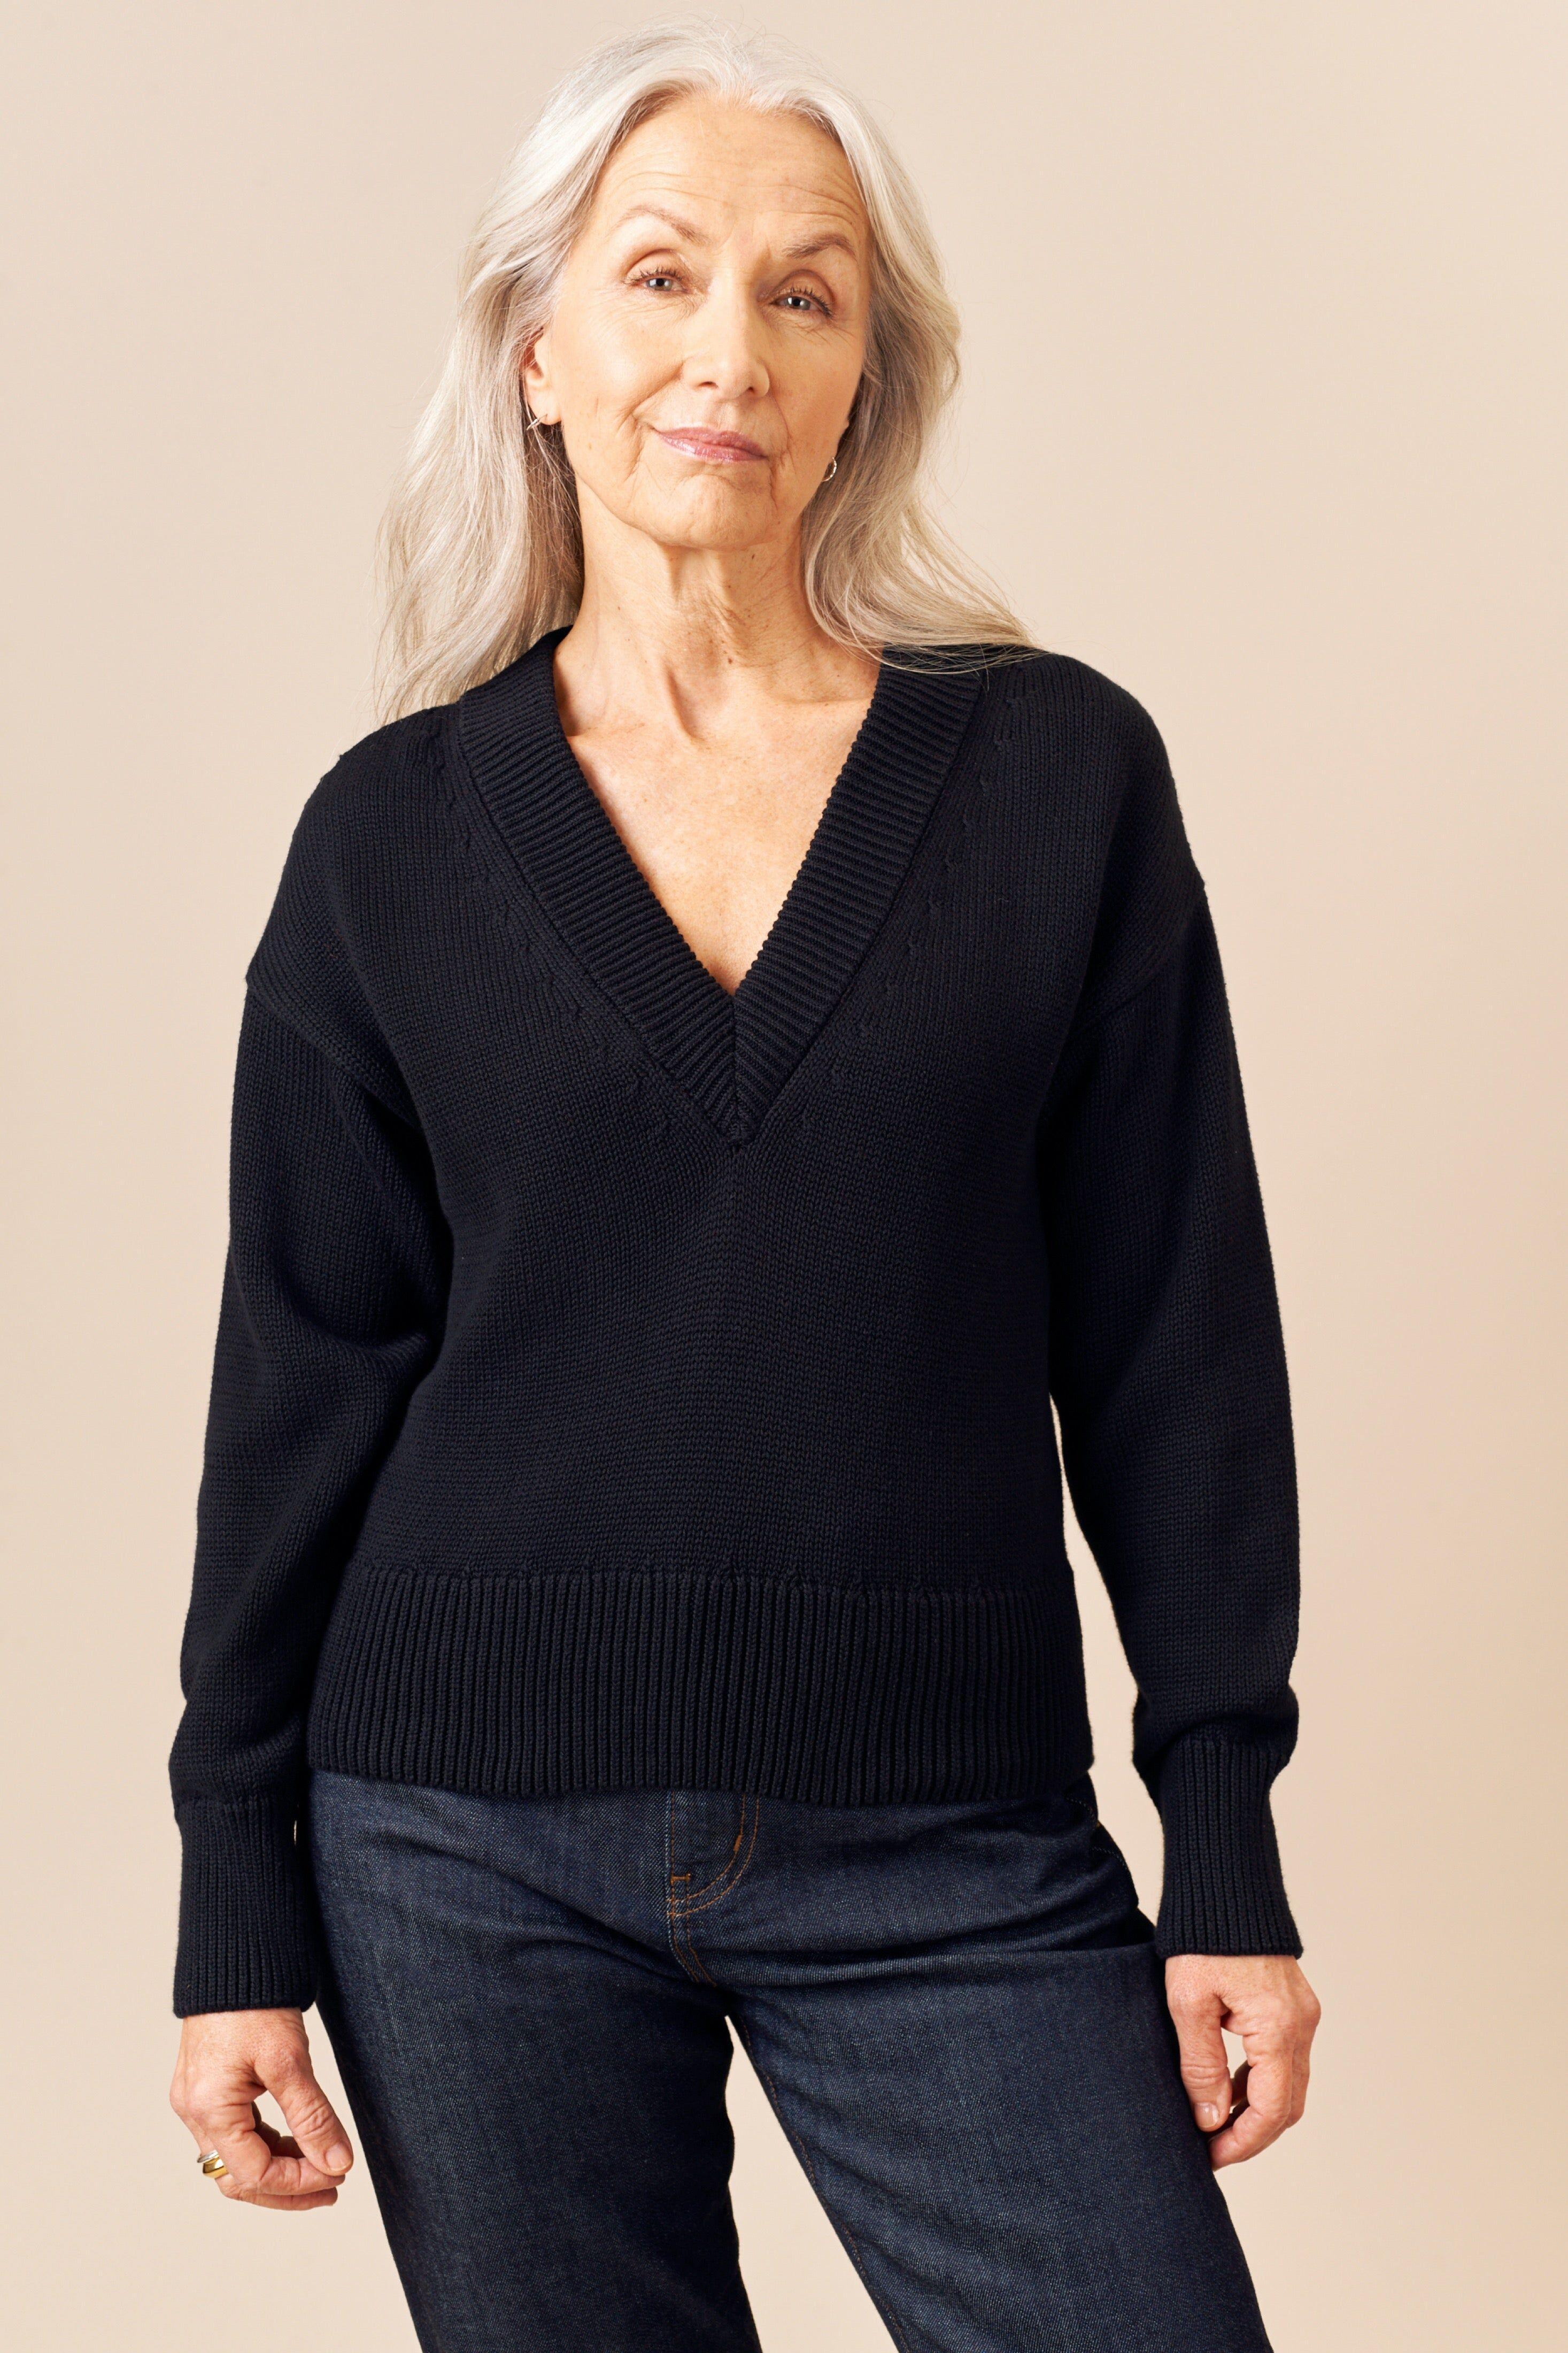 Kotn Women's Deep V-Neck Sweater in Black, Size Medium